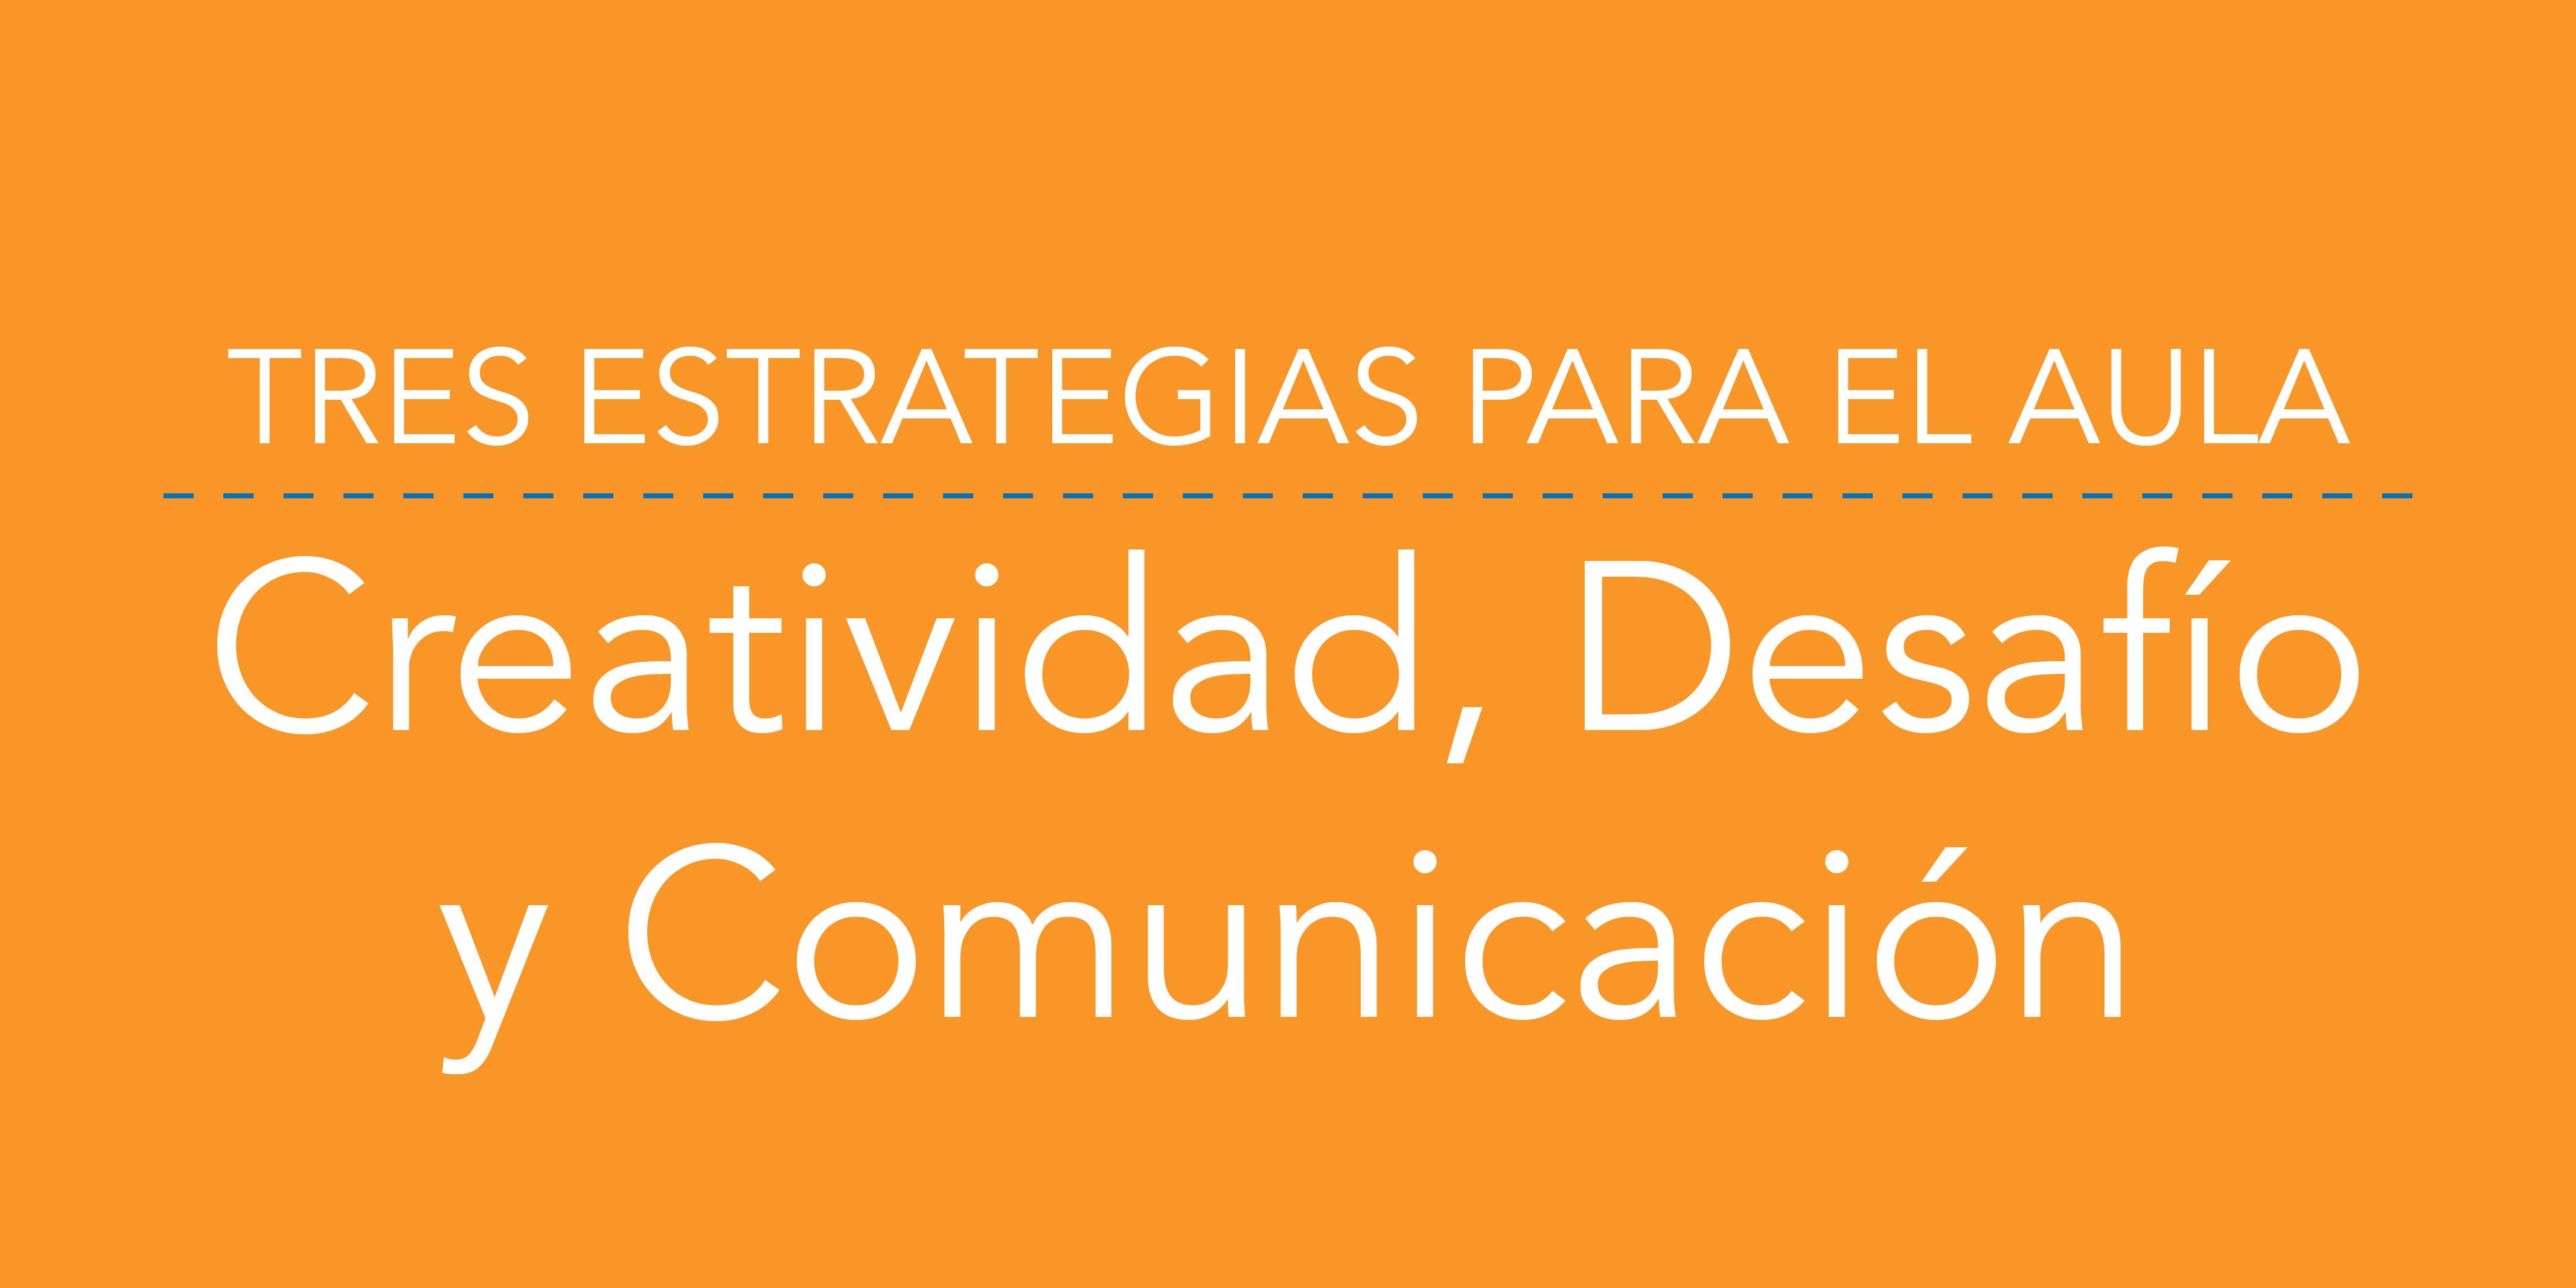 TresEstrategiasParaElAula.png